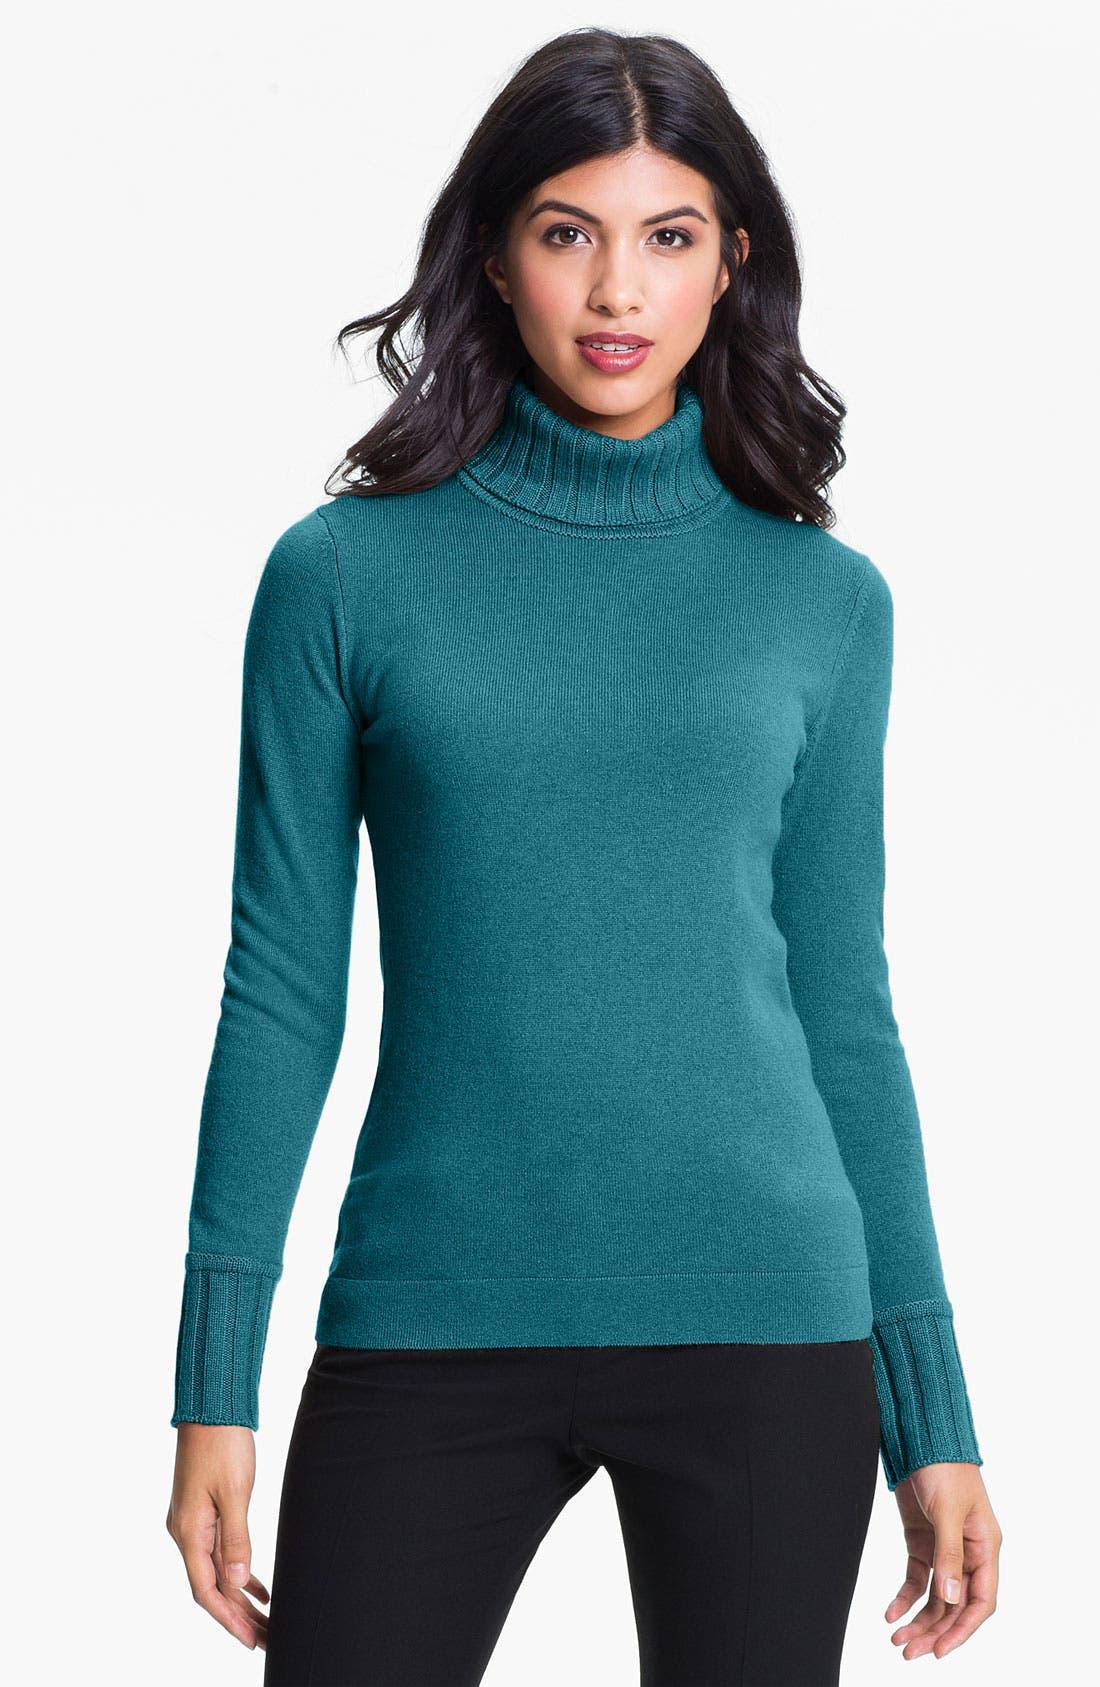 Alternate Image 1 Selected - Cashmere Cashmere Turtleneck Sweater